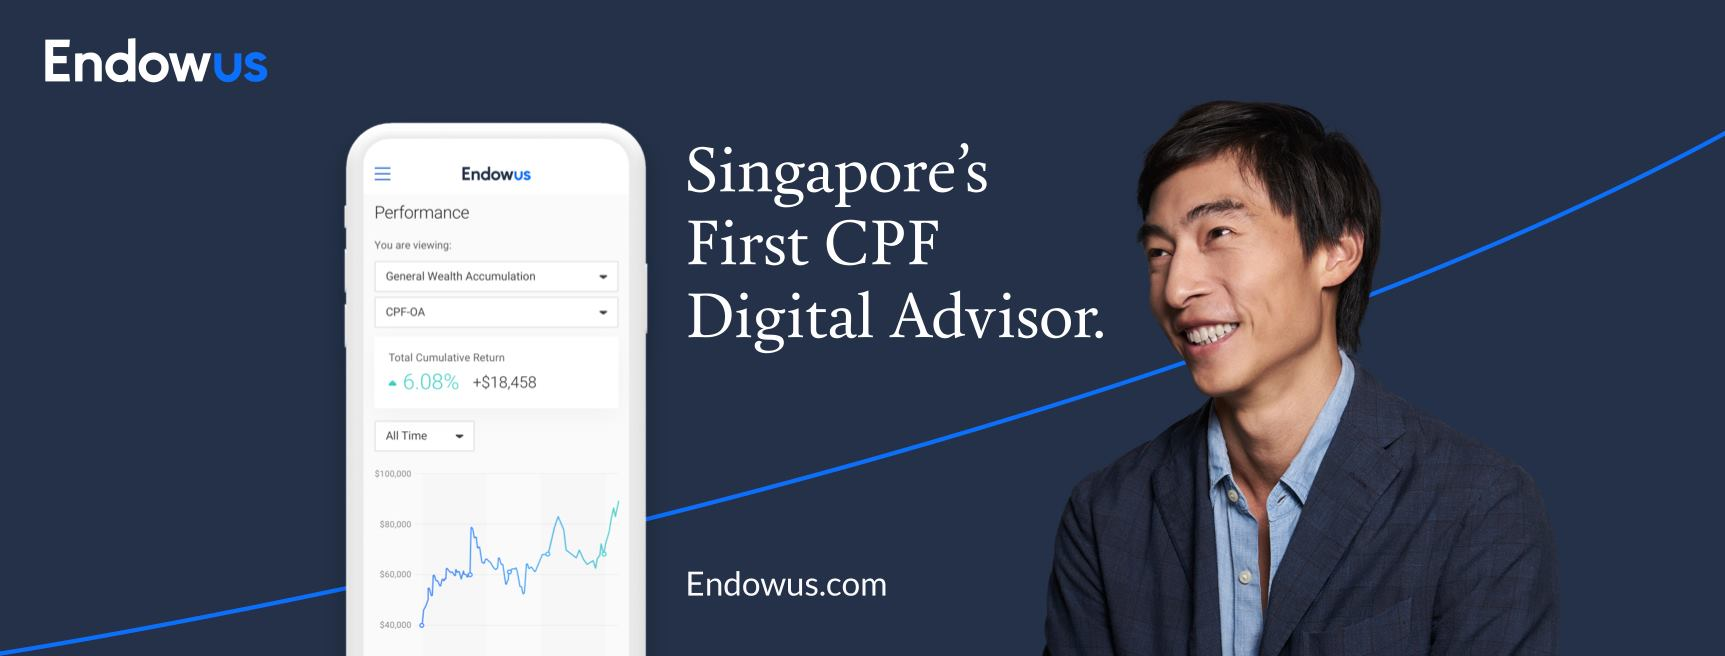 ENDOWUS SINGAPORE'S FIRST CPF DIGITAL ADVISOR